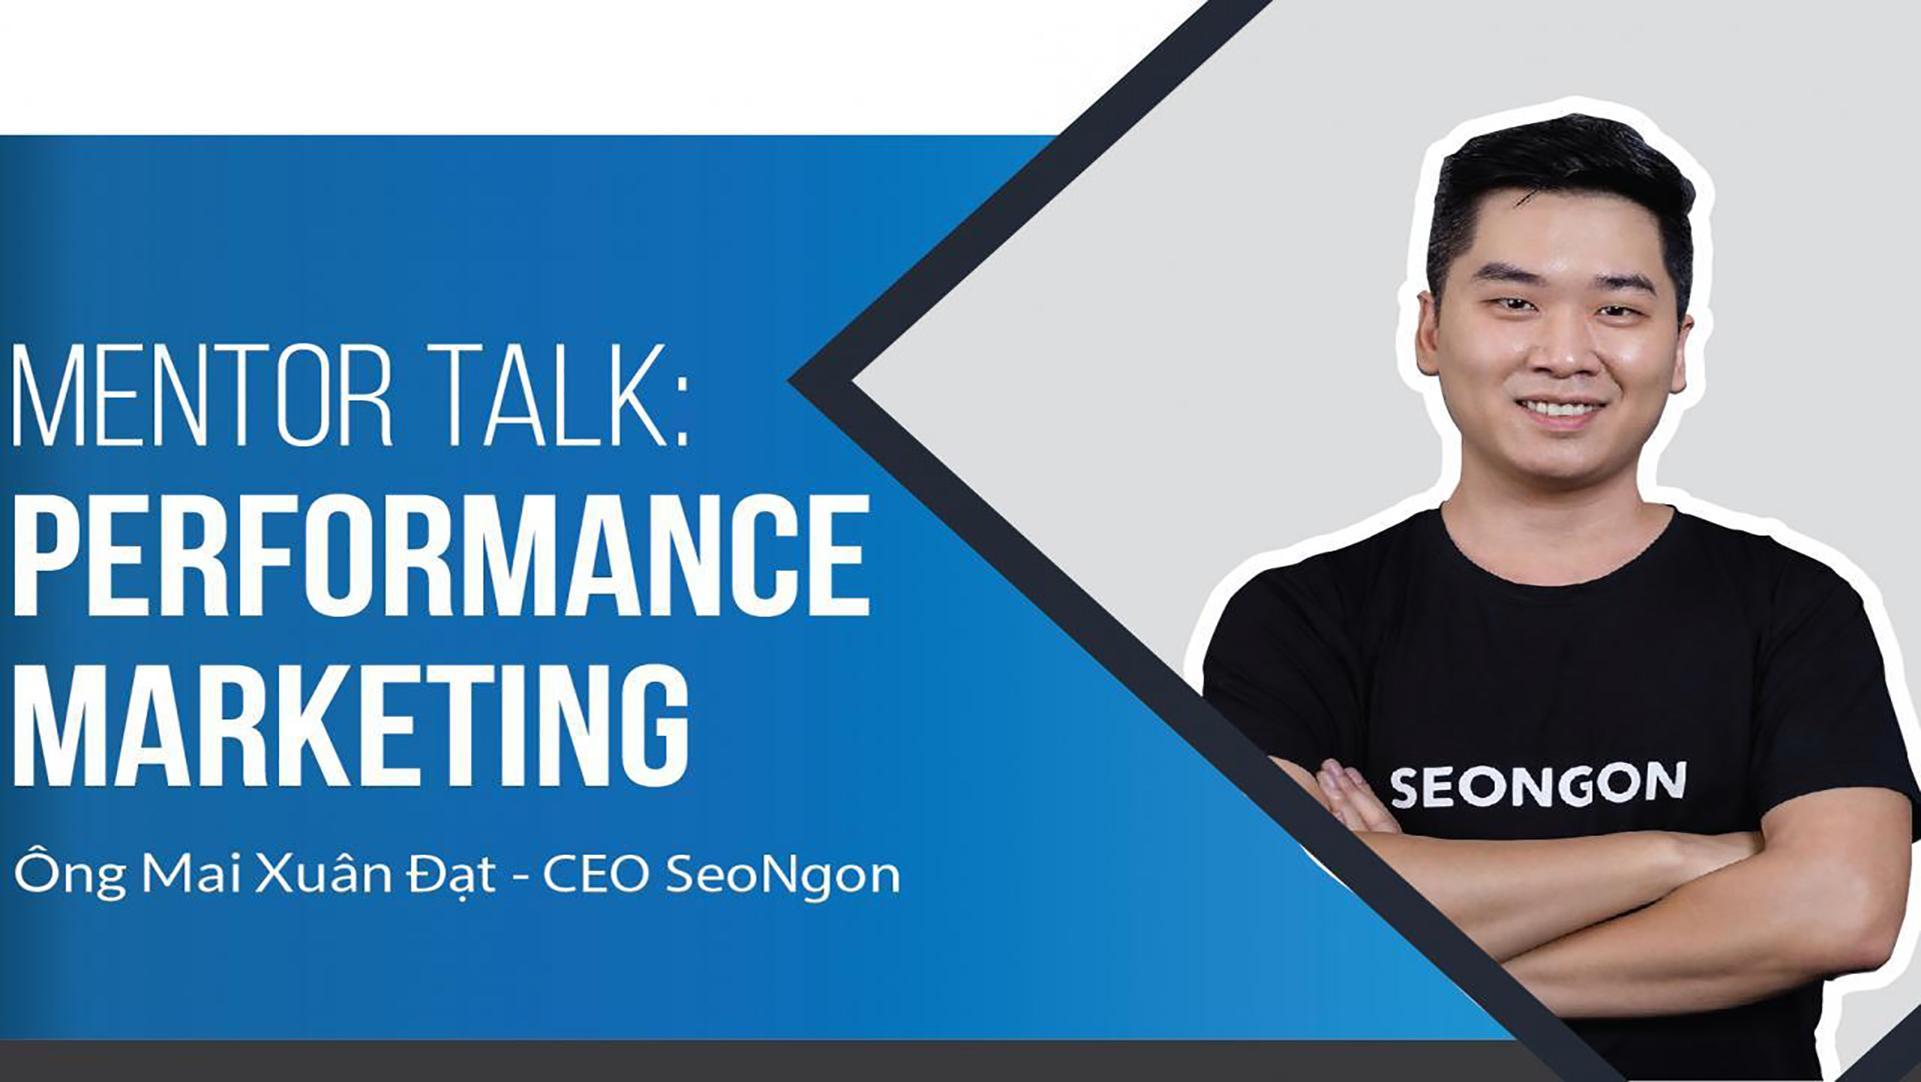 Performance Marketing [Mentor Talk]